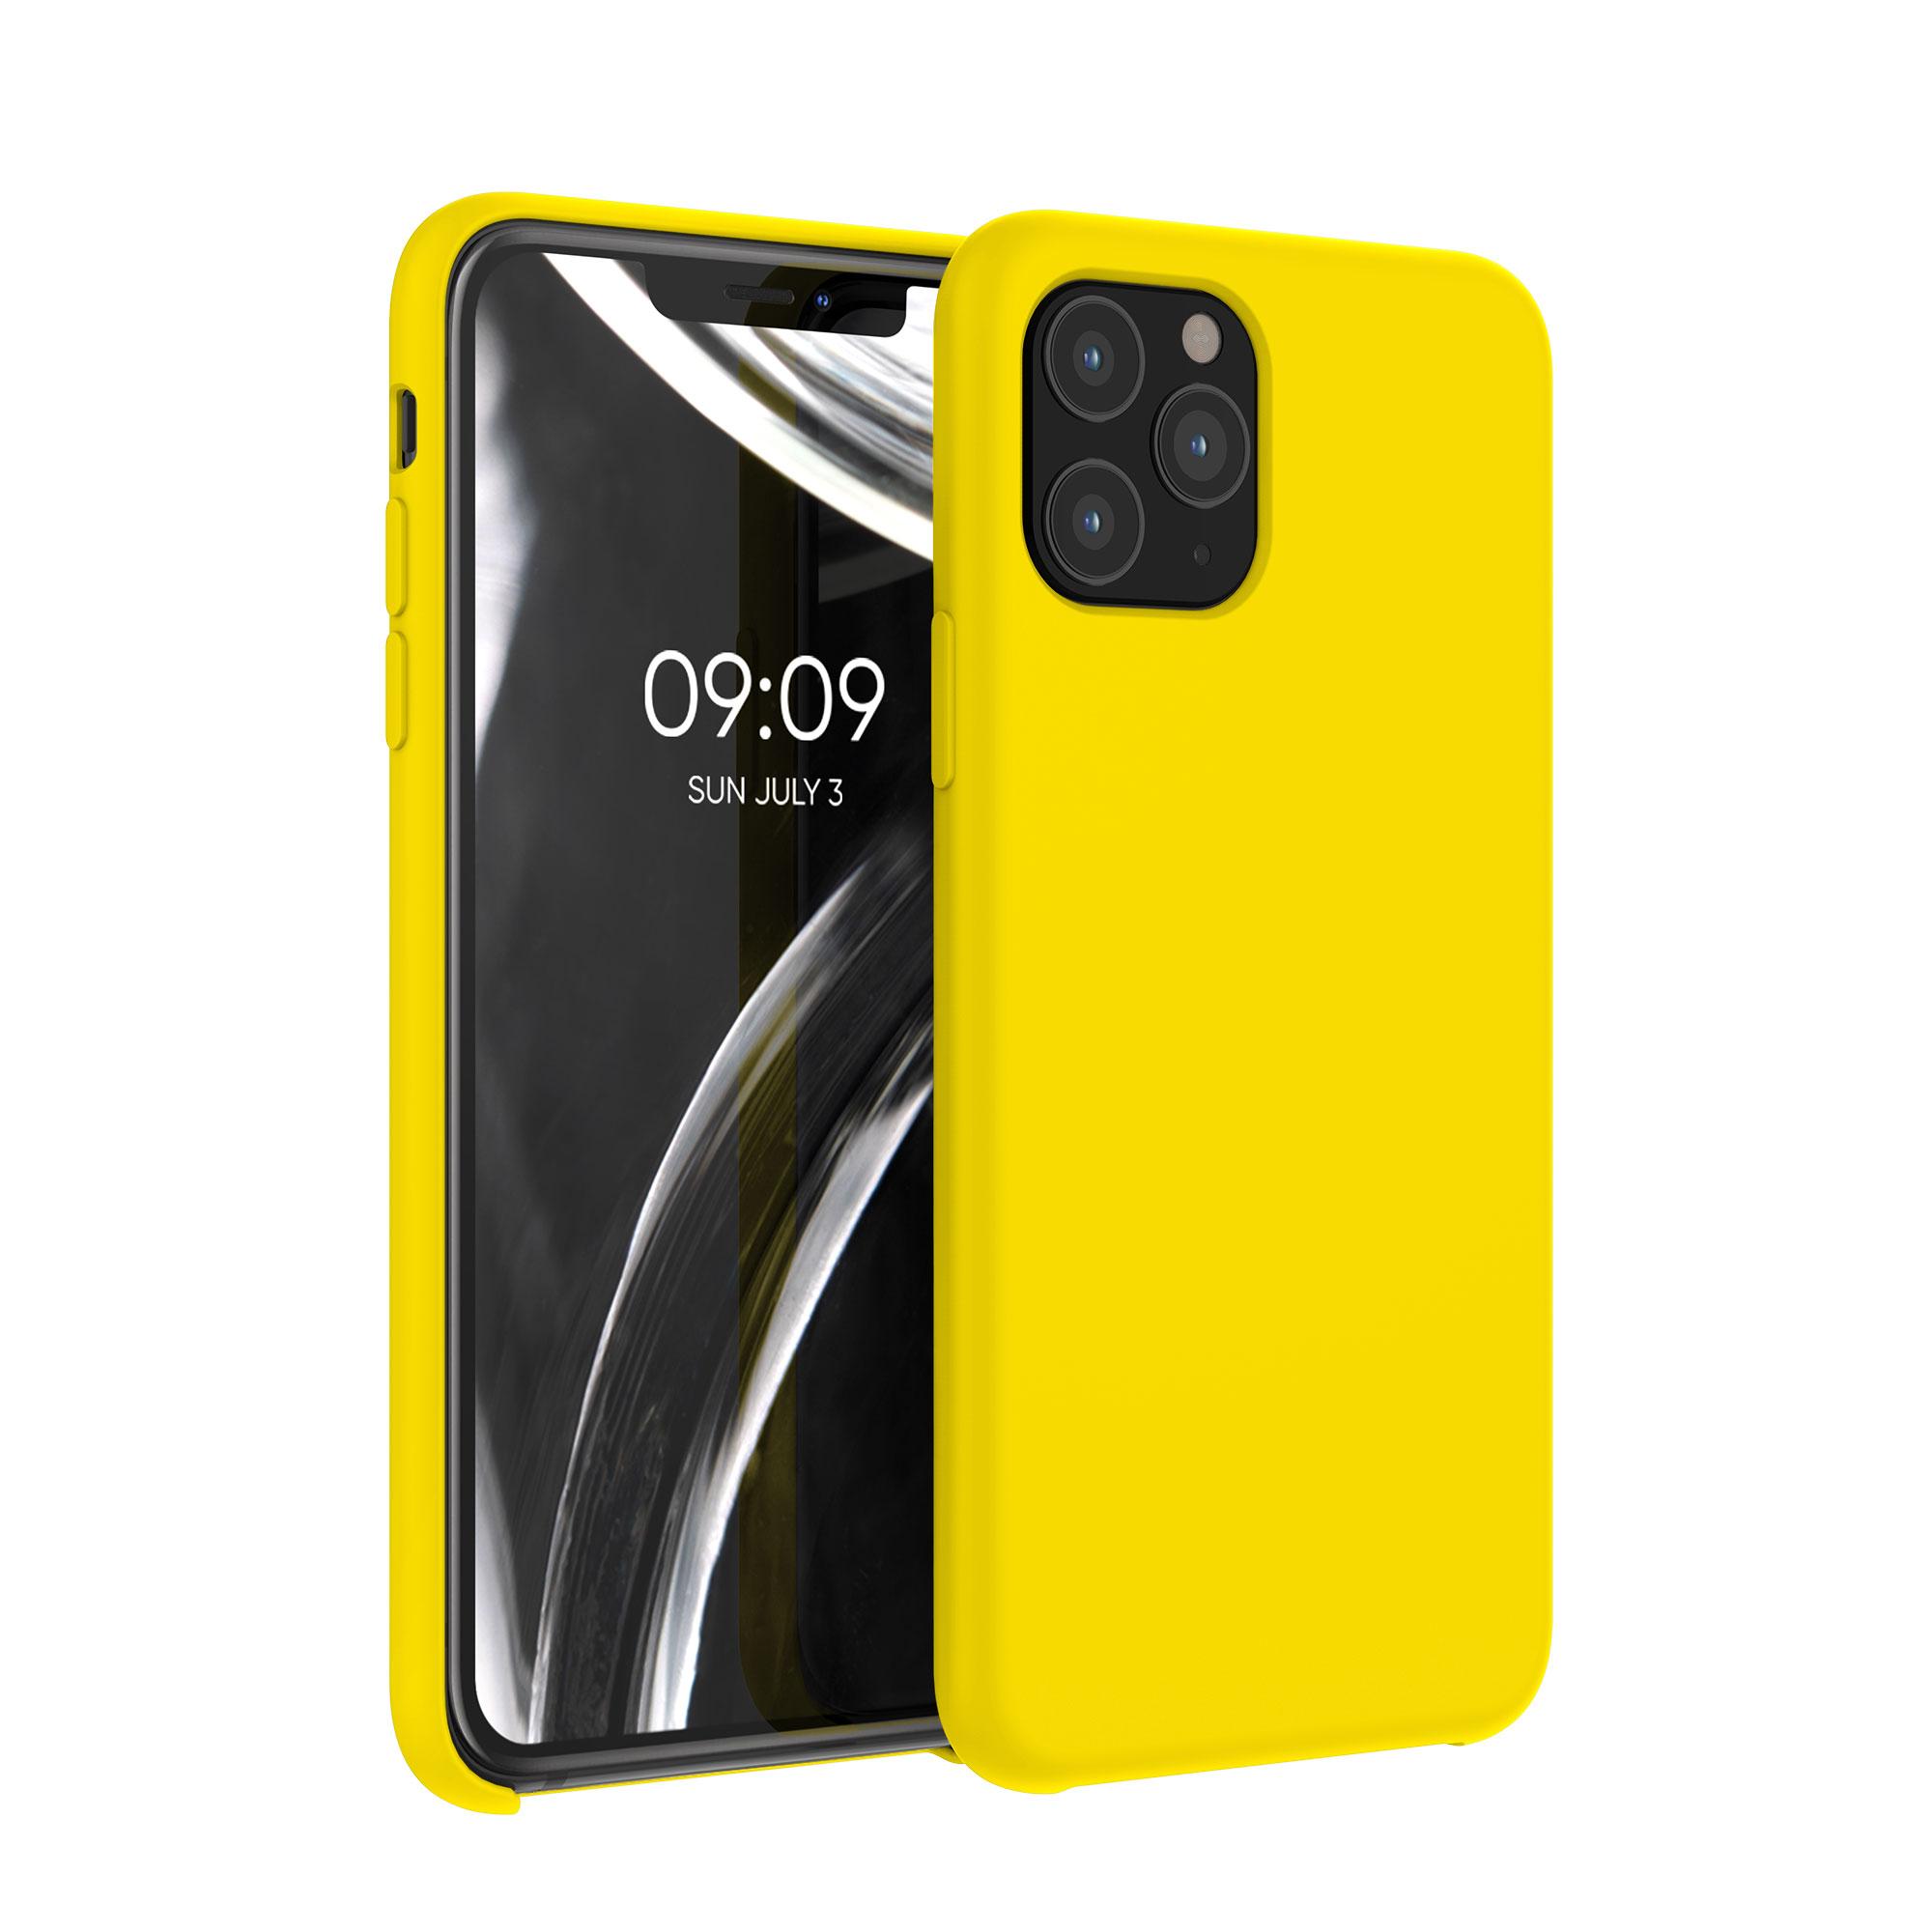 Kvalitní silikonové TPU pouzdro pro Apple iPhone 11 Pro - Vibrant Yellow